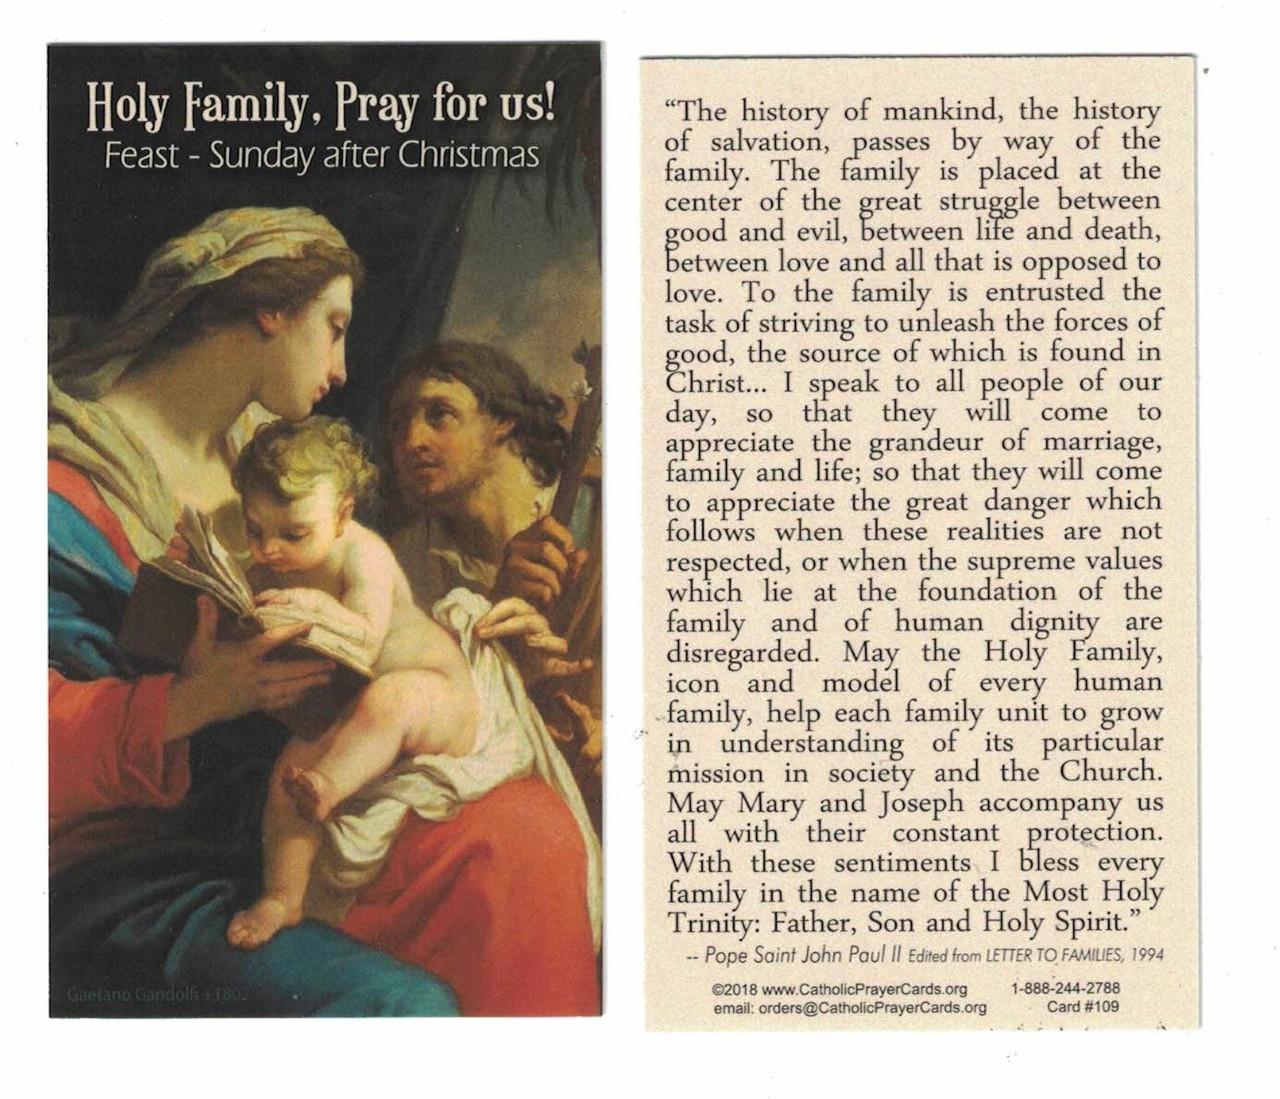 Holy Family, Pray for Us Prayer Card